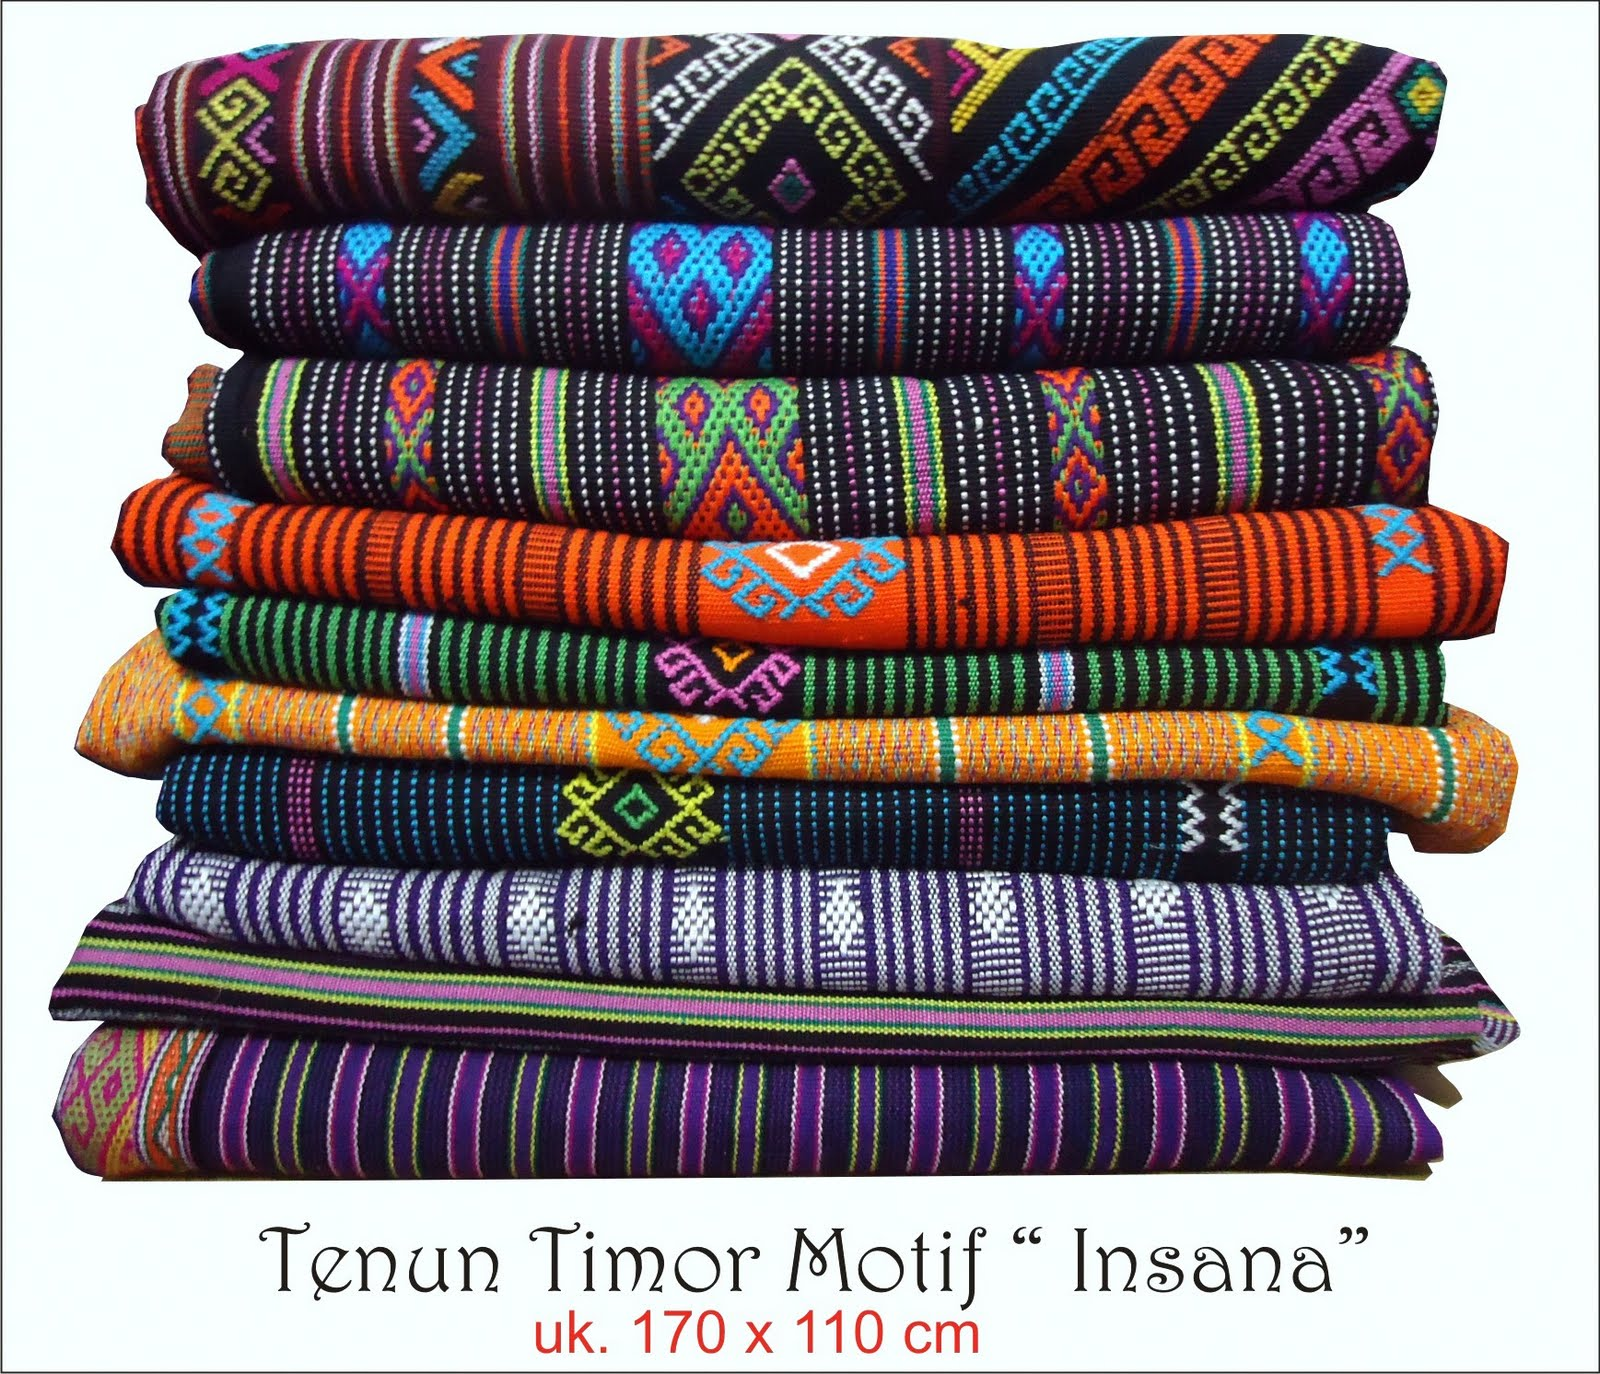 Kain Tenun Timor - Motif Insana Sotis dan Buna